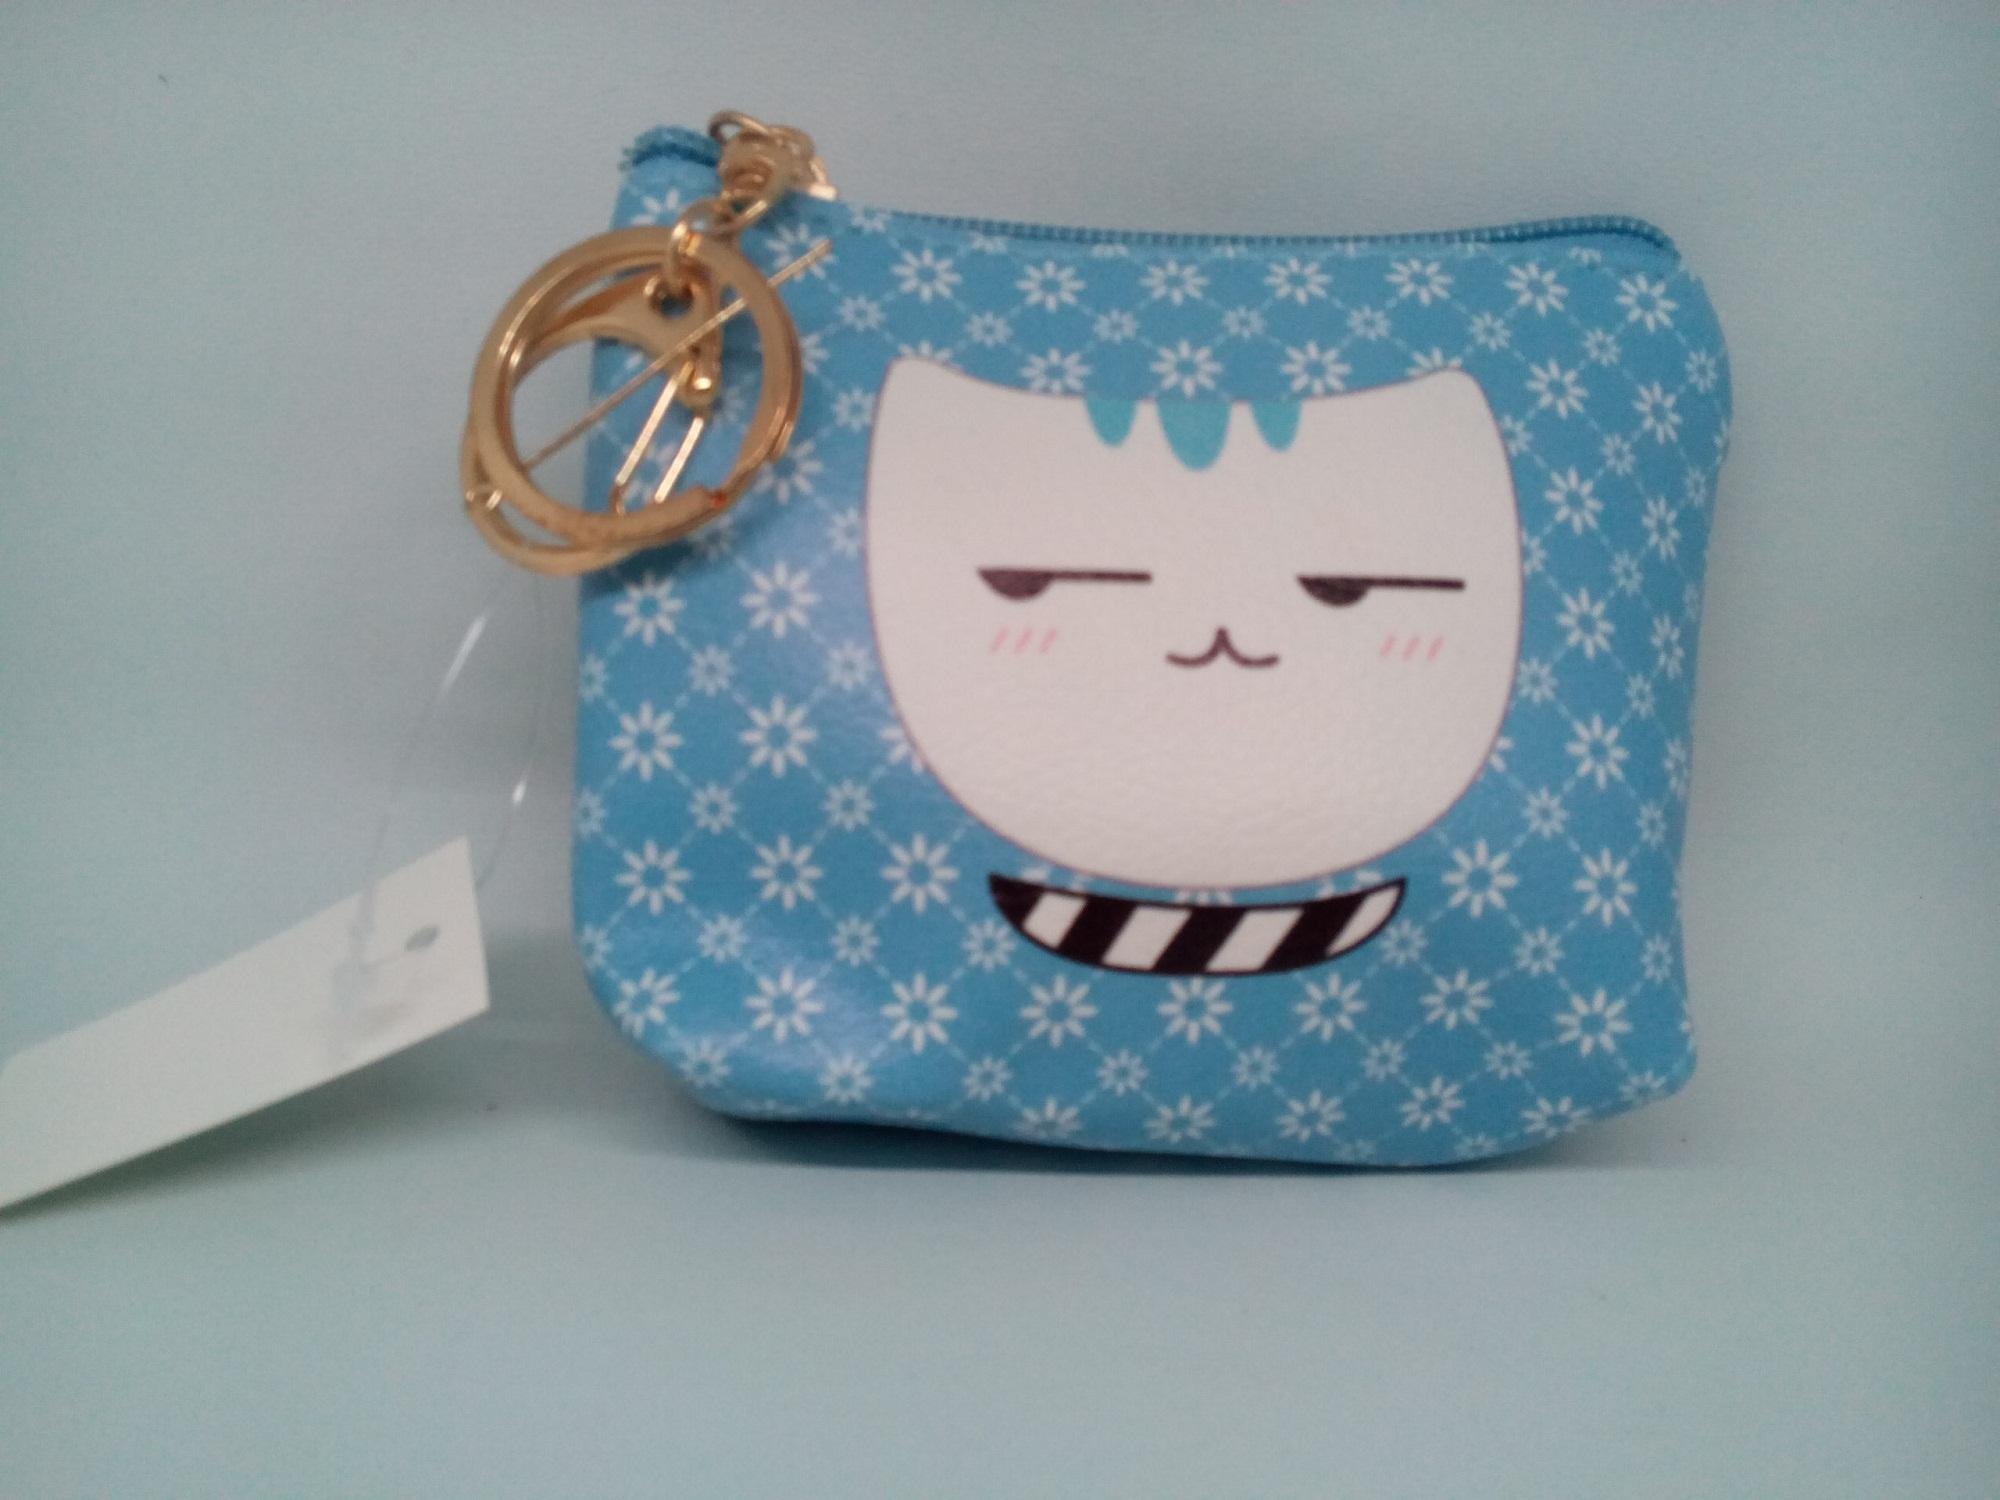 dompet koin Wanita / cewek / anak perempuan pouch import murah - clue win shop